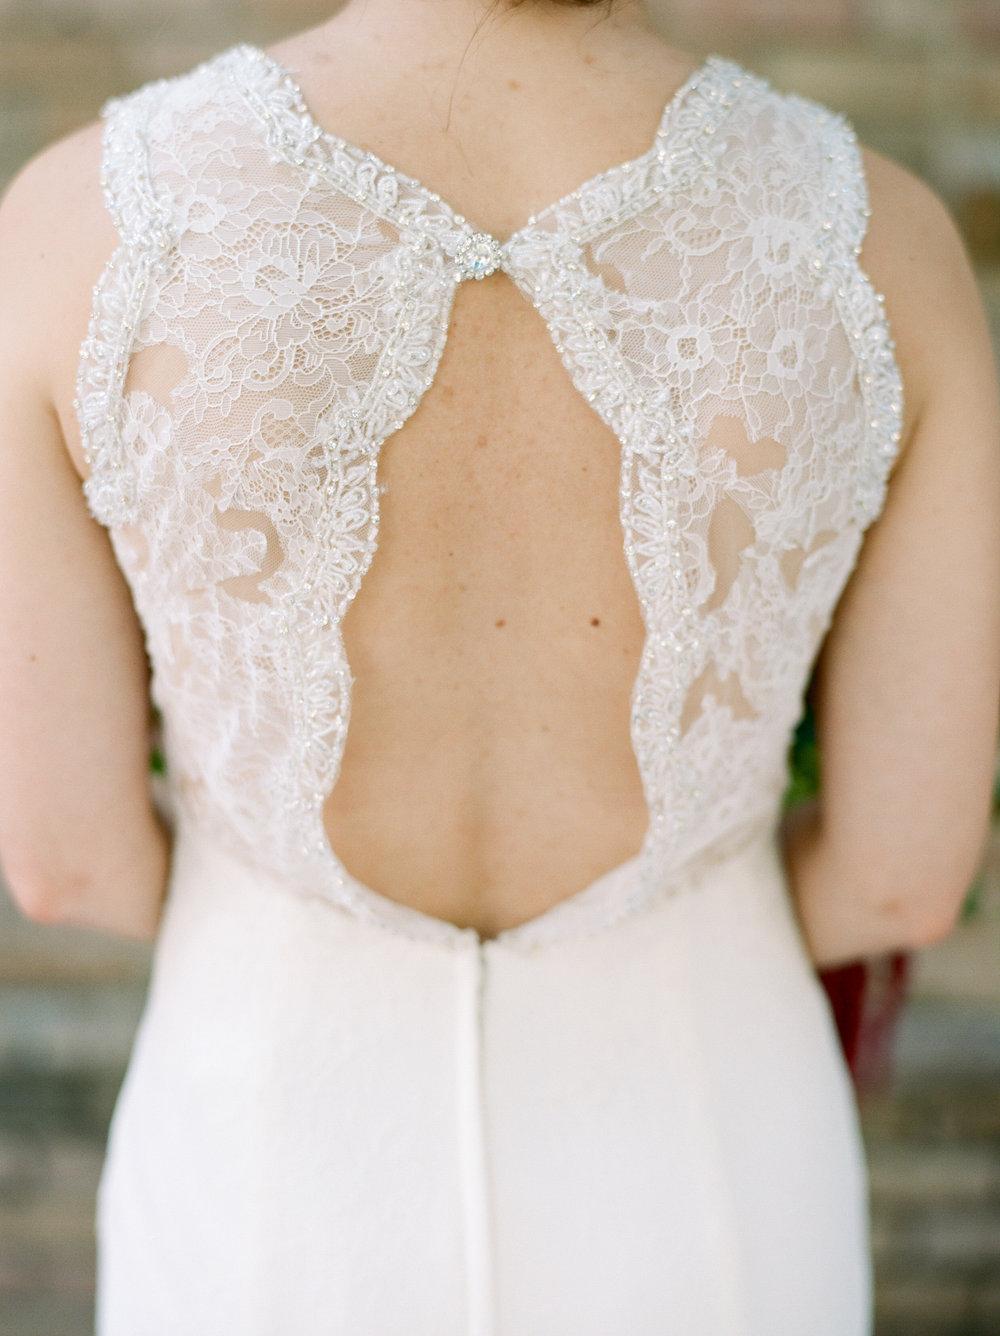 The-Knot-Texas-Fine-Art-Wedding-Film-Destination-Photographer-Houston-Austin-Dallas-New-Orleans-Julia-Ideson-Library-Event-Dana-Josh-Fernandez-Photograph-Top-Best-20.jpg